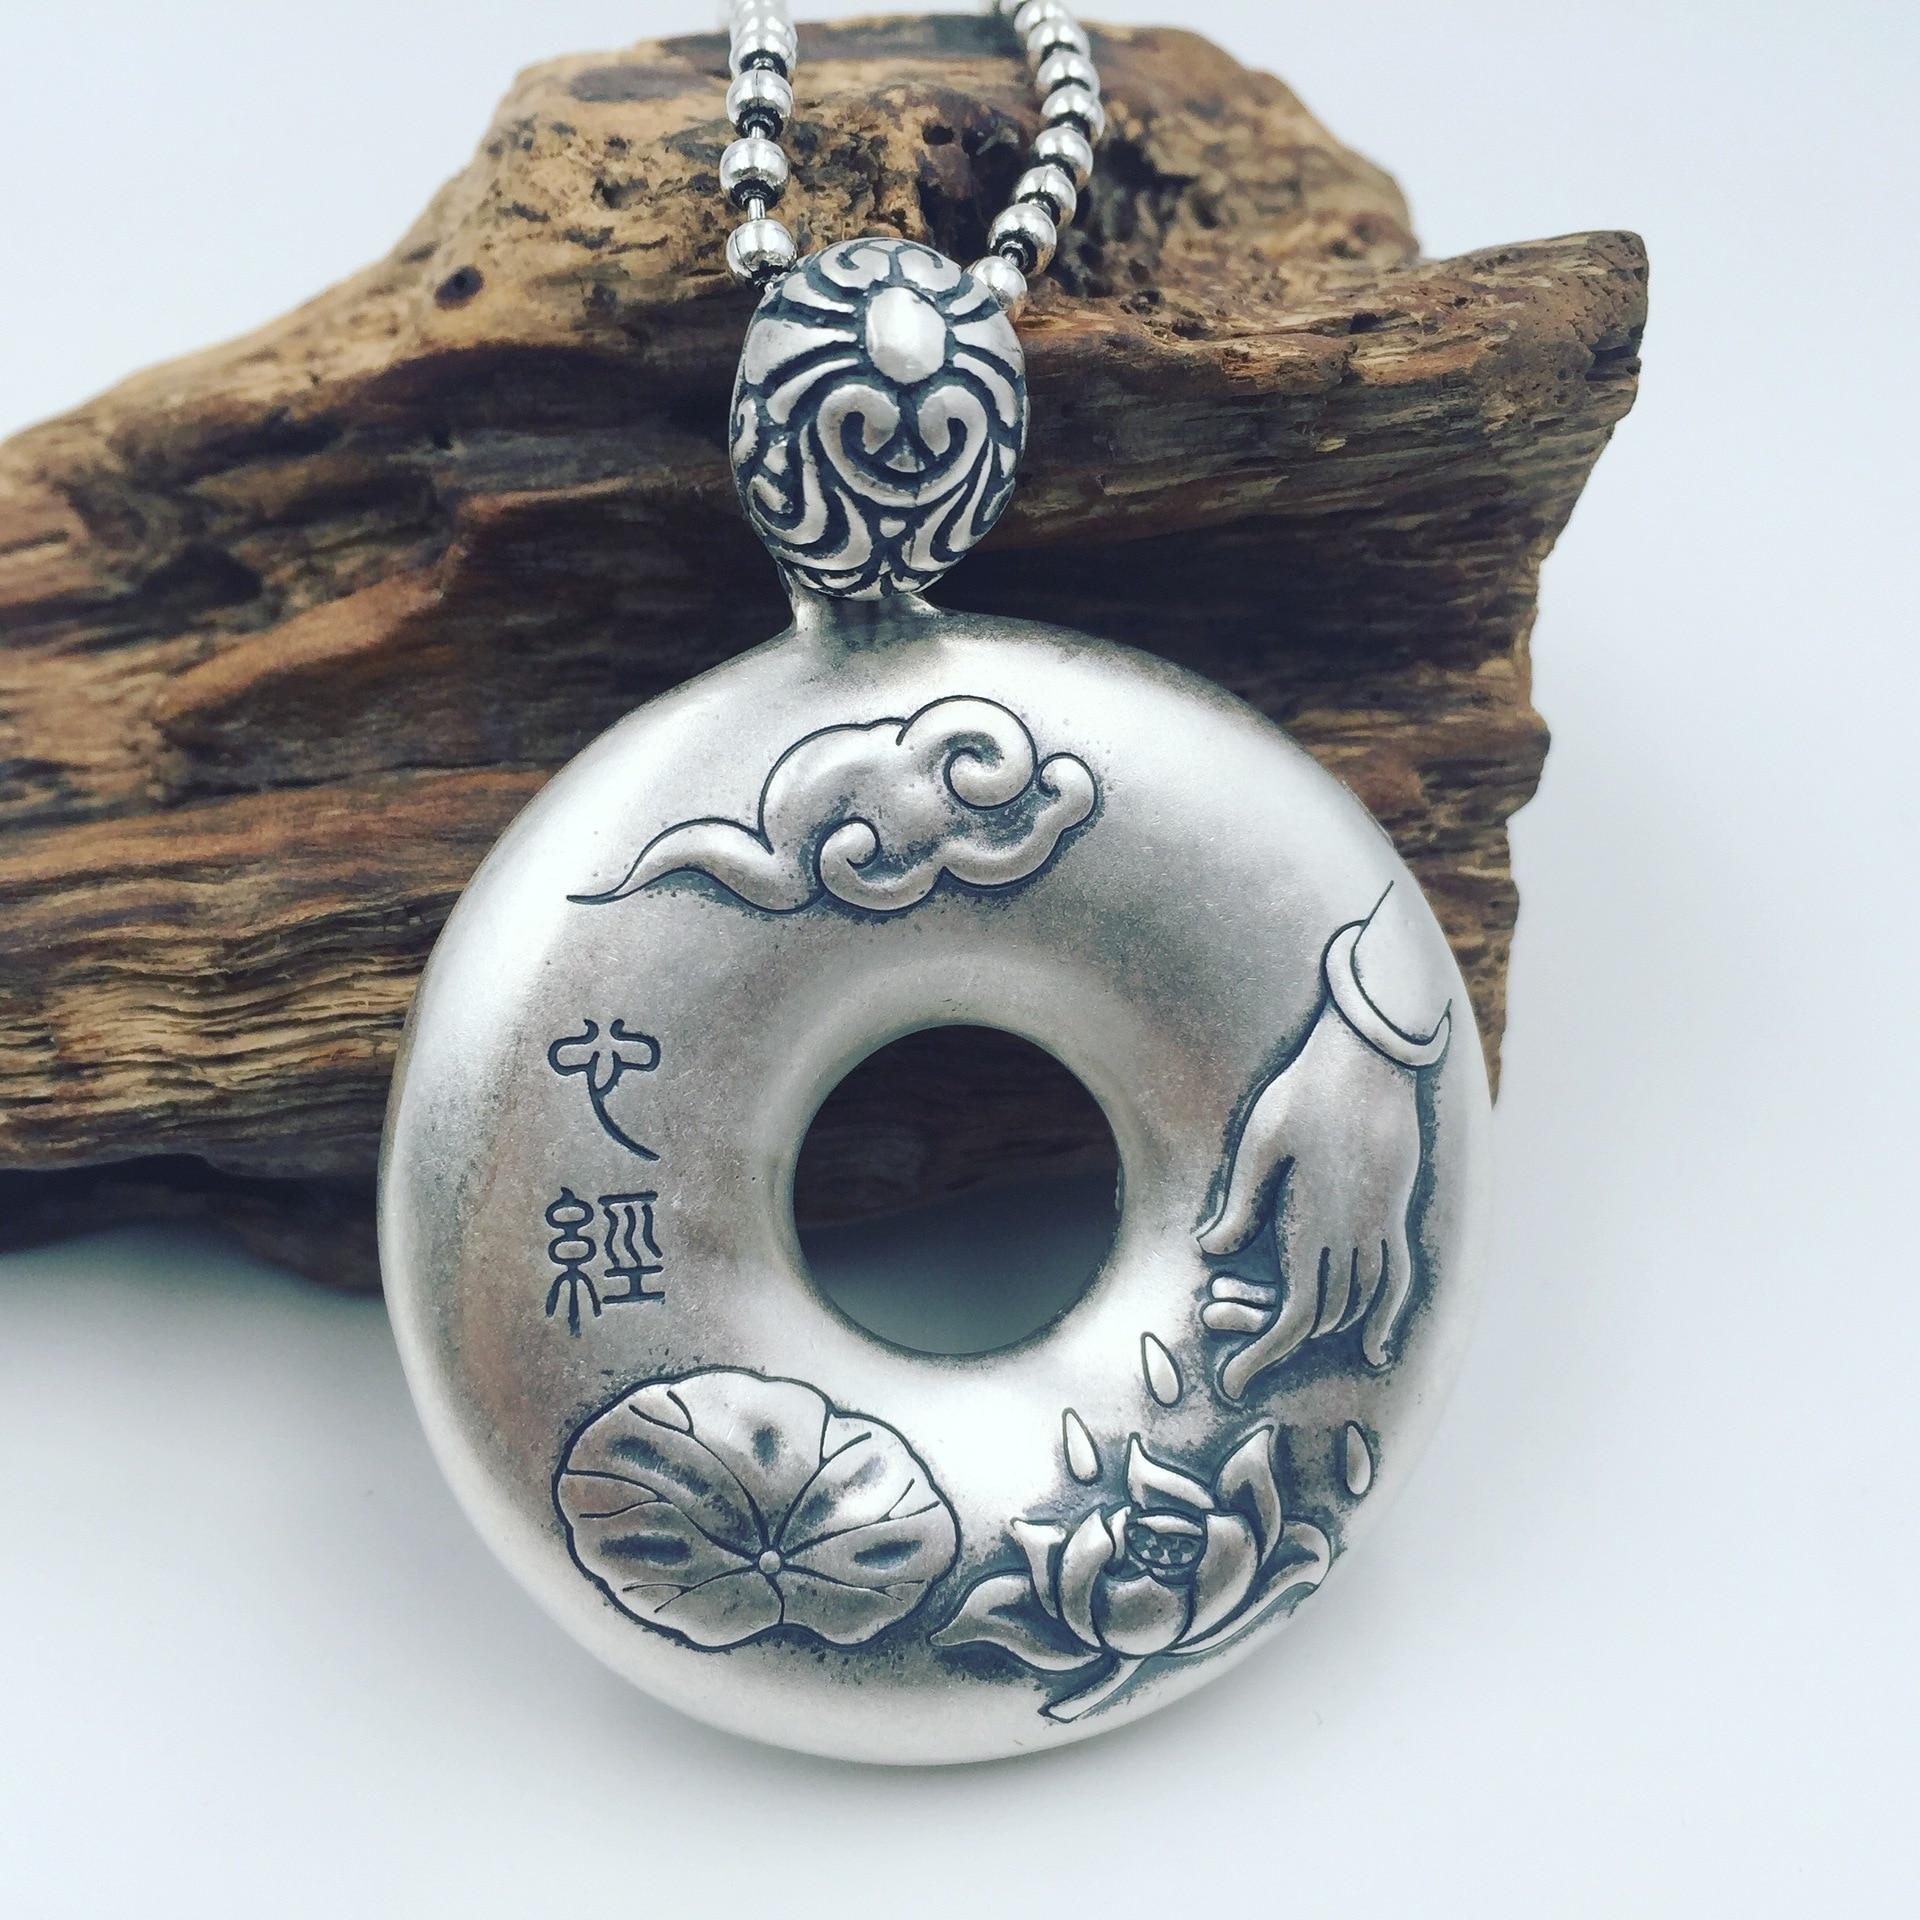 S990 Zuyin silver Lotus Sutra Bergamot buckle silver pendantS990 Zuyin silver Lotus Sutra Bergamot buckle silver pendant